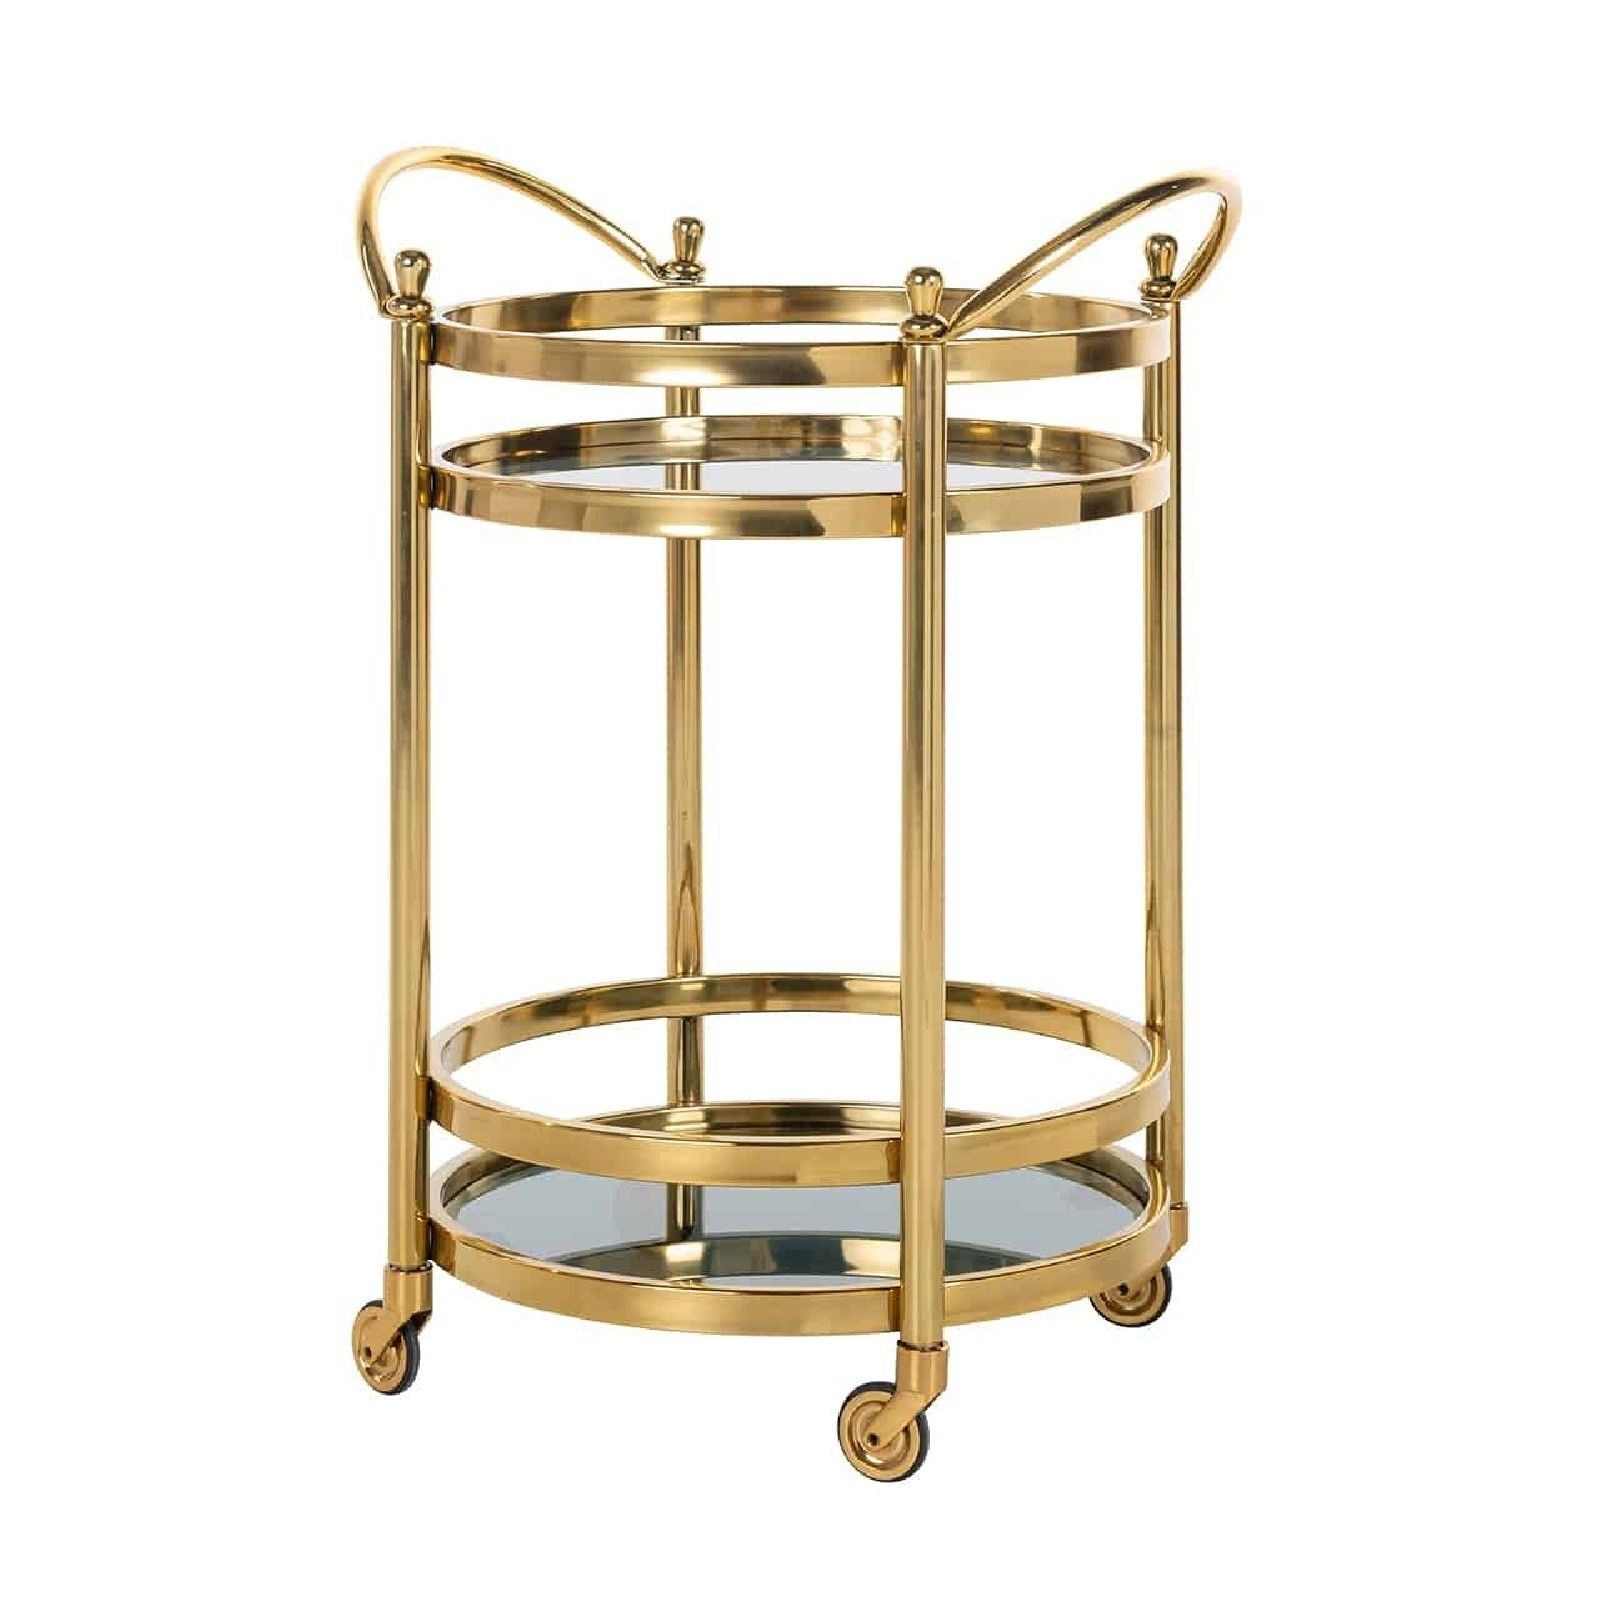 Trolley Hendricks rond dorée avec verre Meuble Déco Tendance - 45